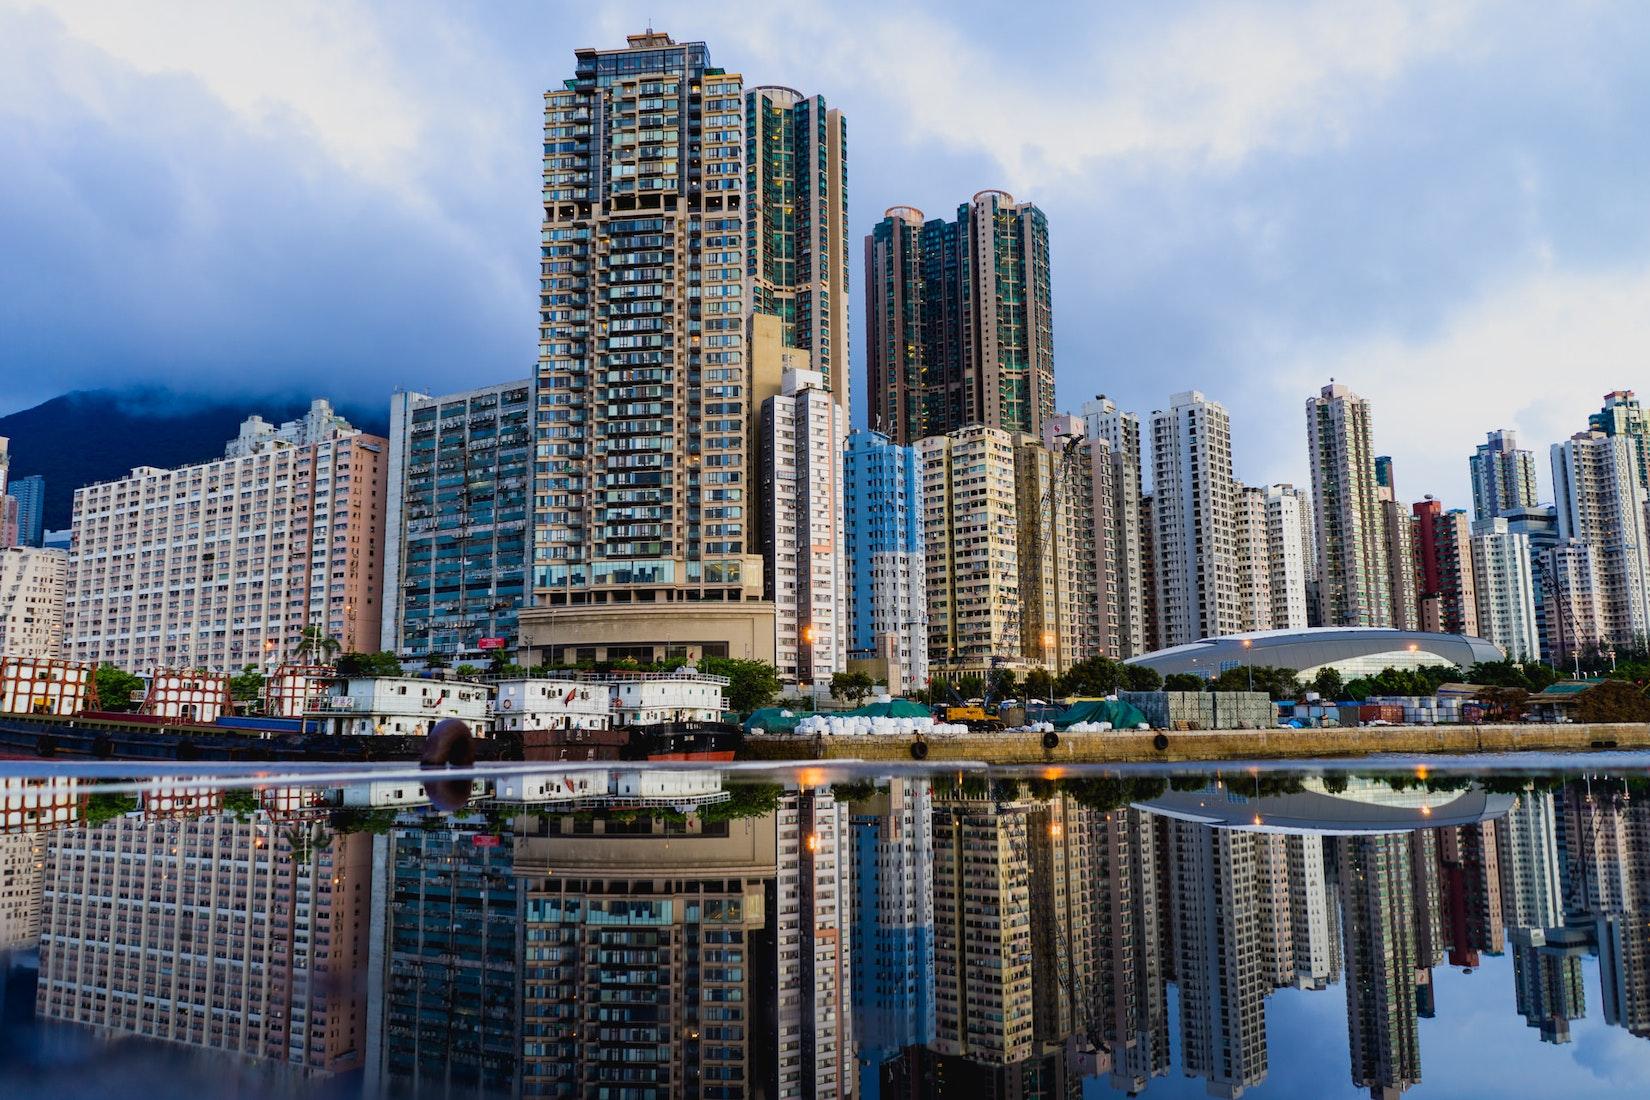 Hong Kong image from Sai Wan aka Instagram Pier